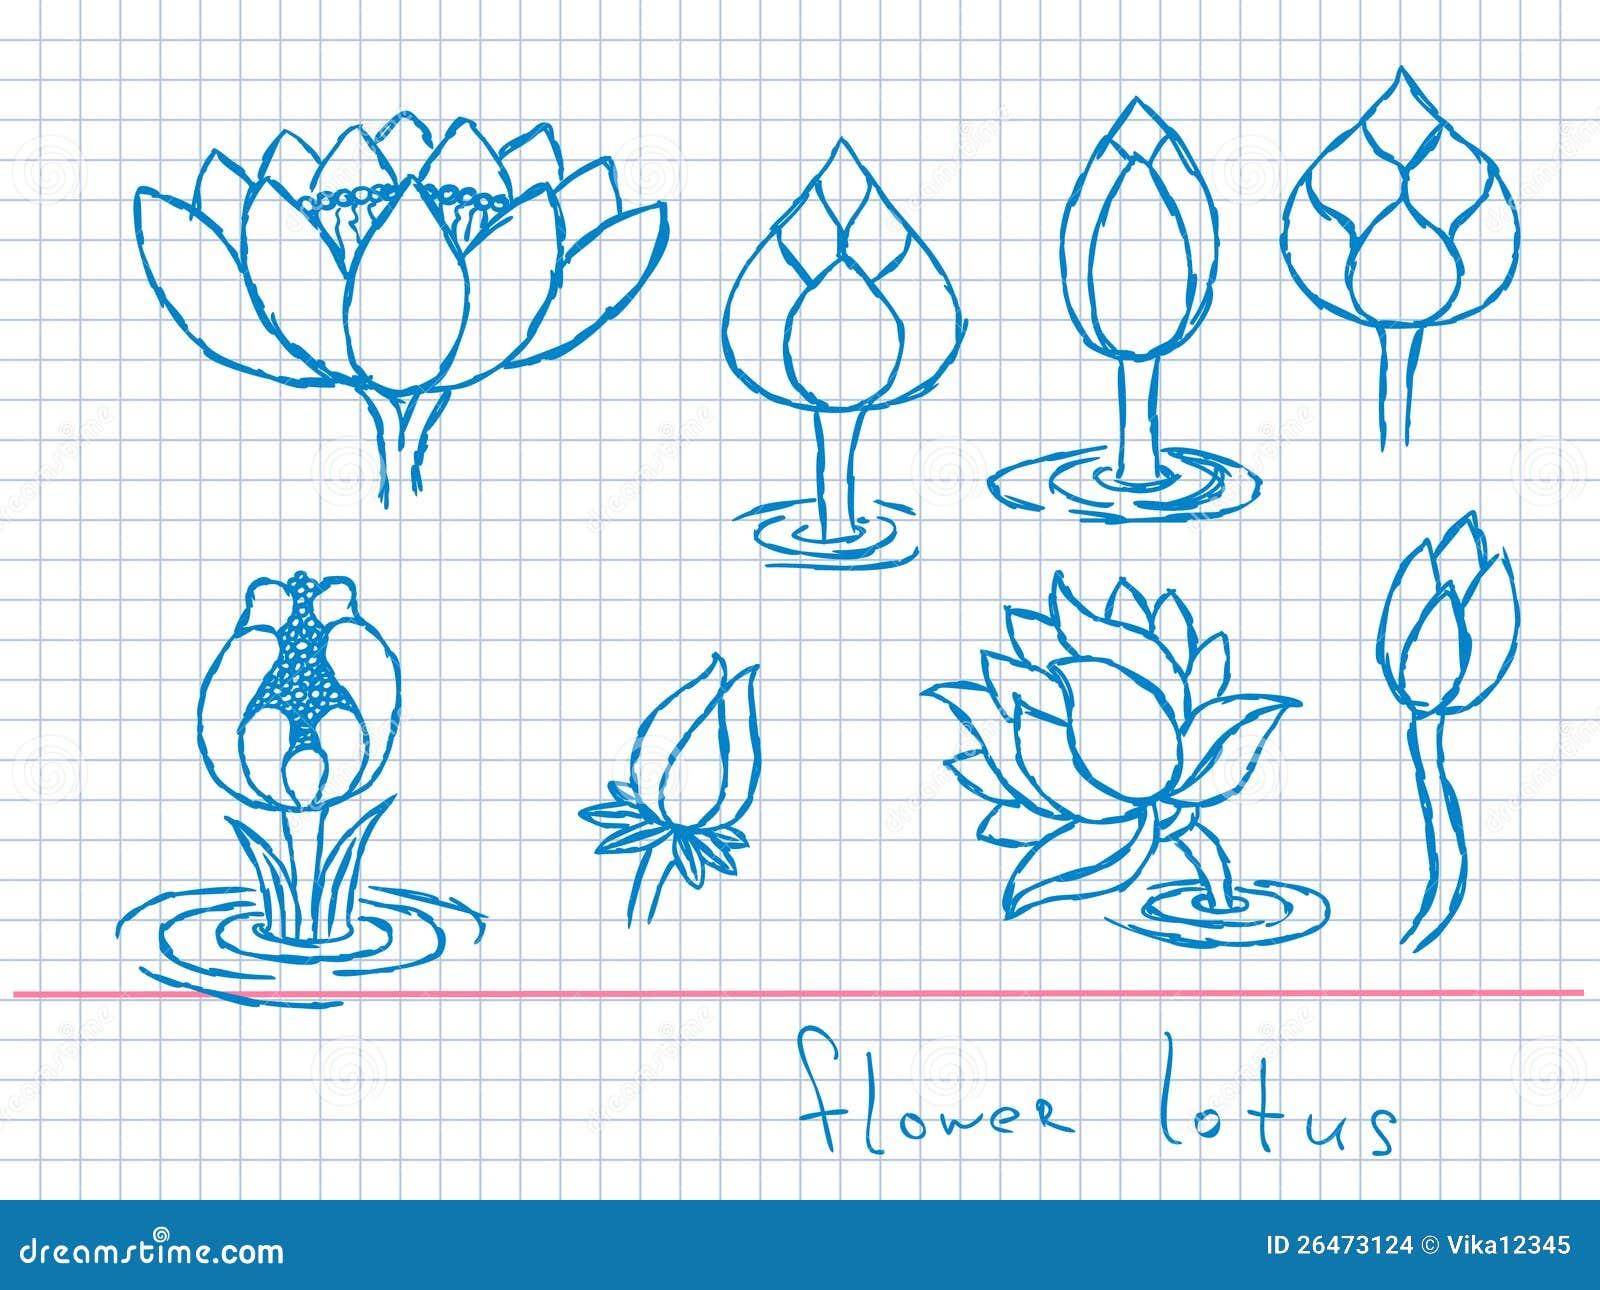 Lotus Flower Graffiti